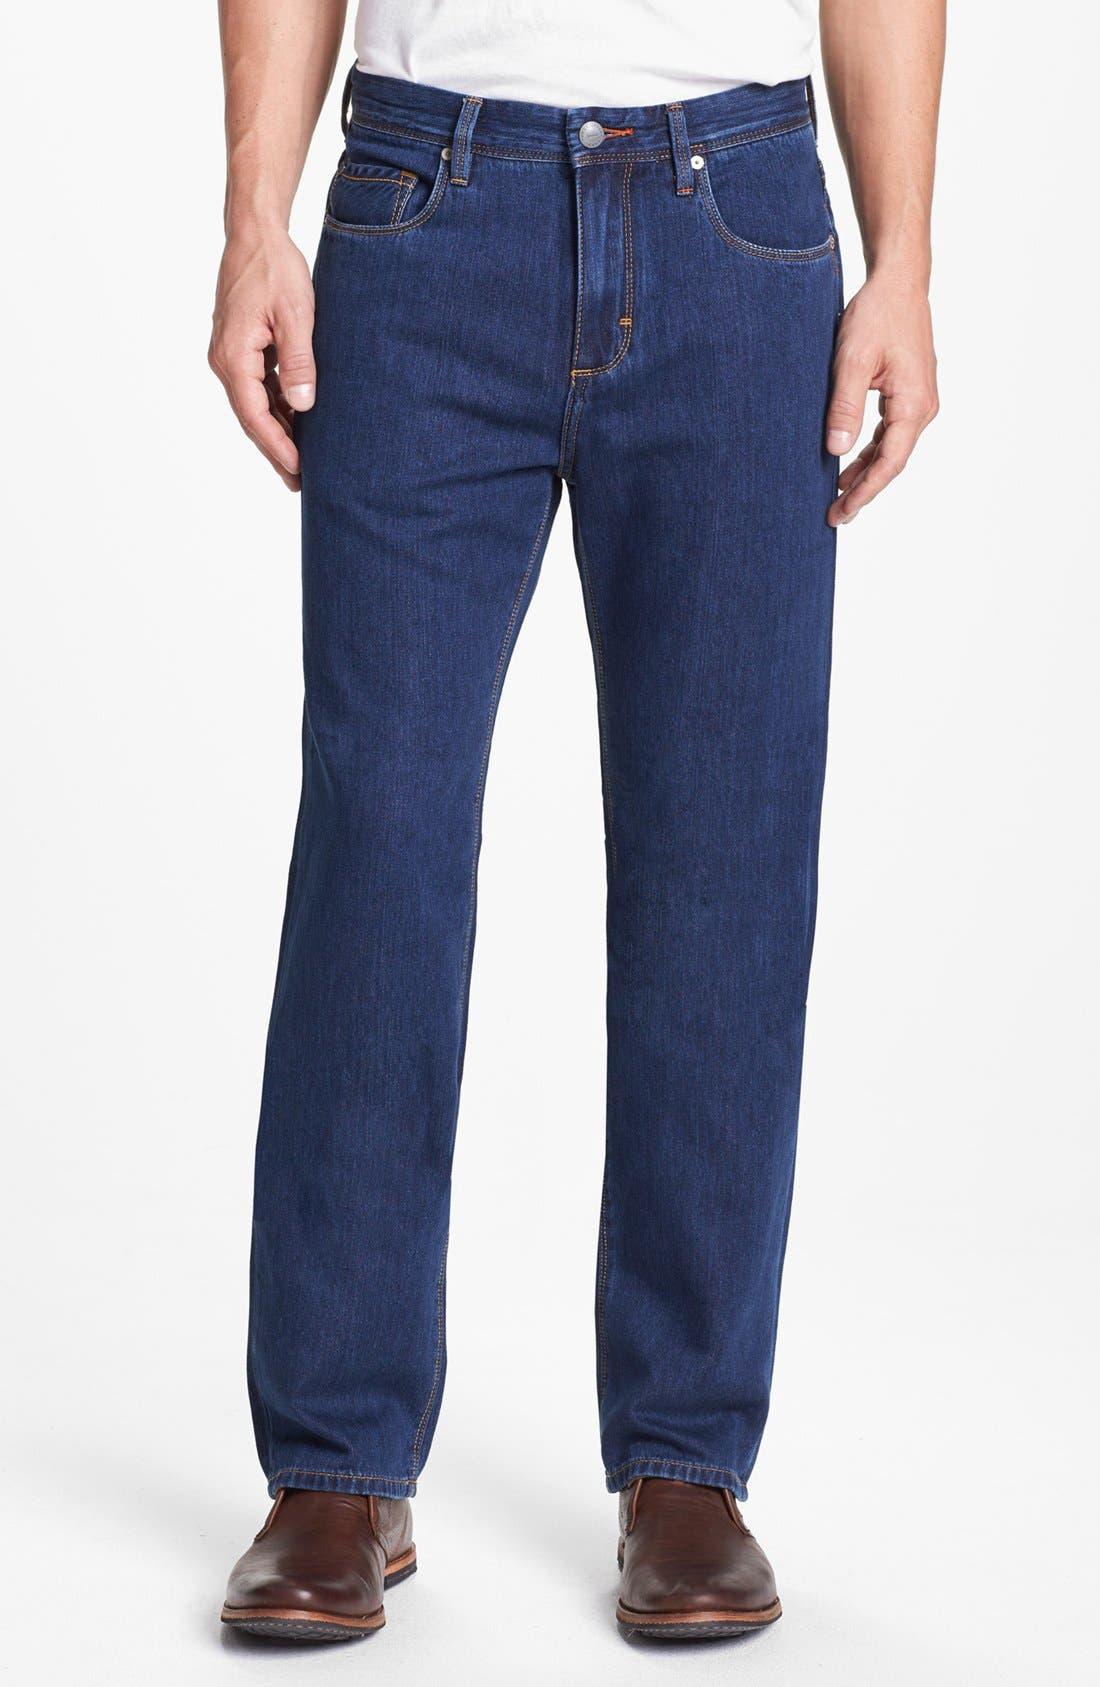 Main Image - Tommy Bahama Denim 'Coastal Island' Standard Fit Jeans (Medium)